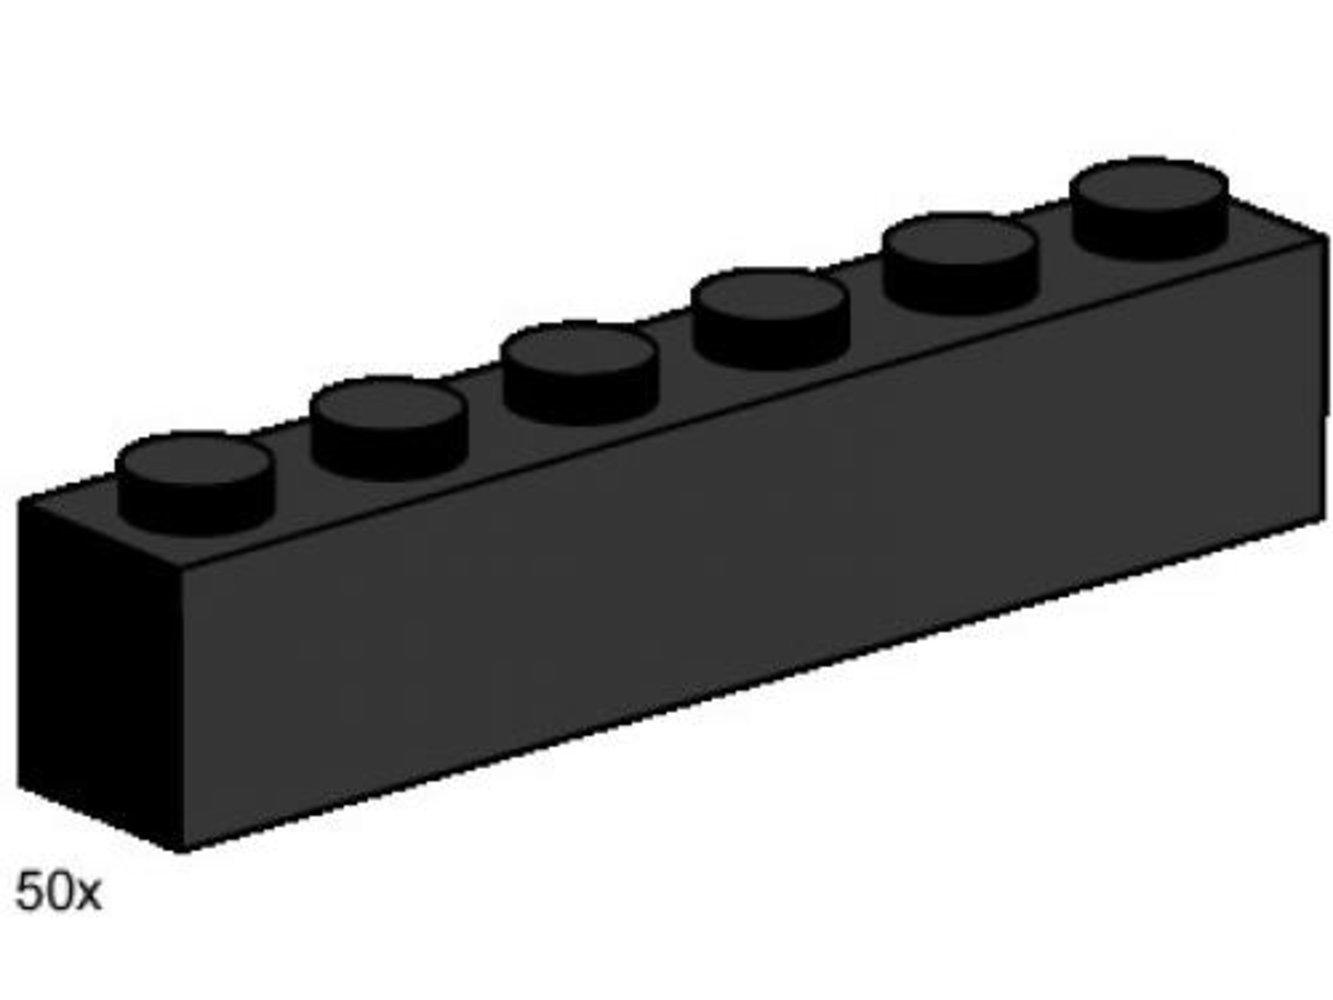 1 x 6 Black Bricks